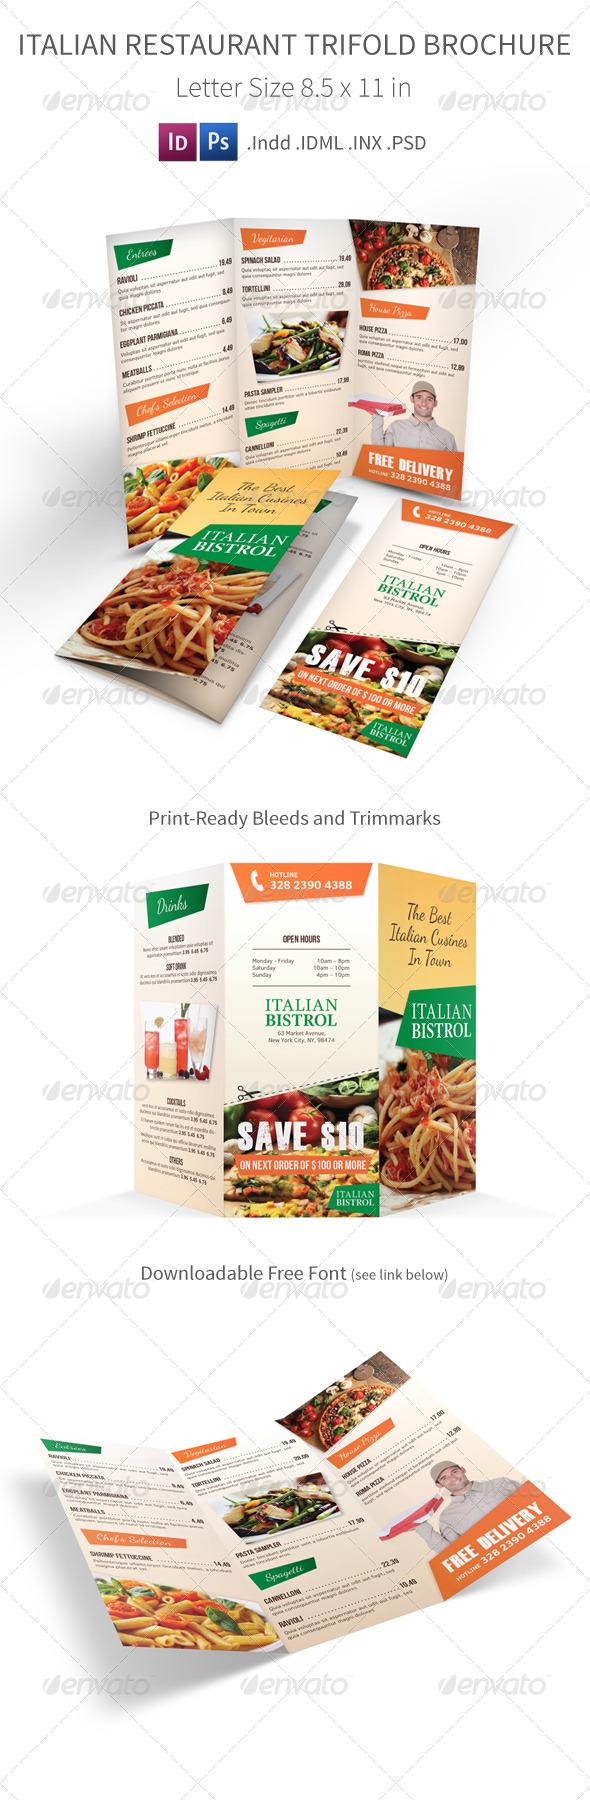 GraphicRiver Italian Restaurant Trifold Menu 7584993